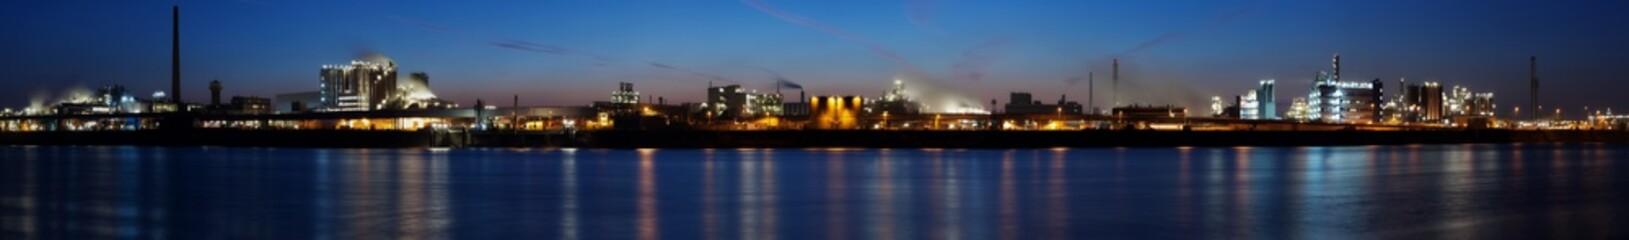 Industries (high-resolution panorama)